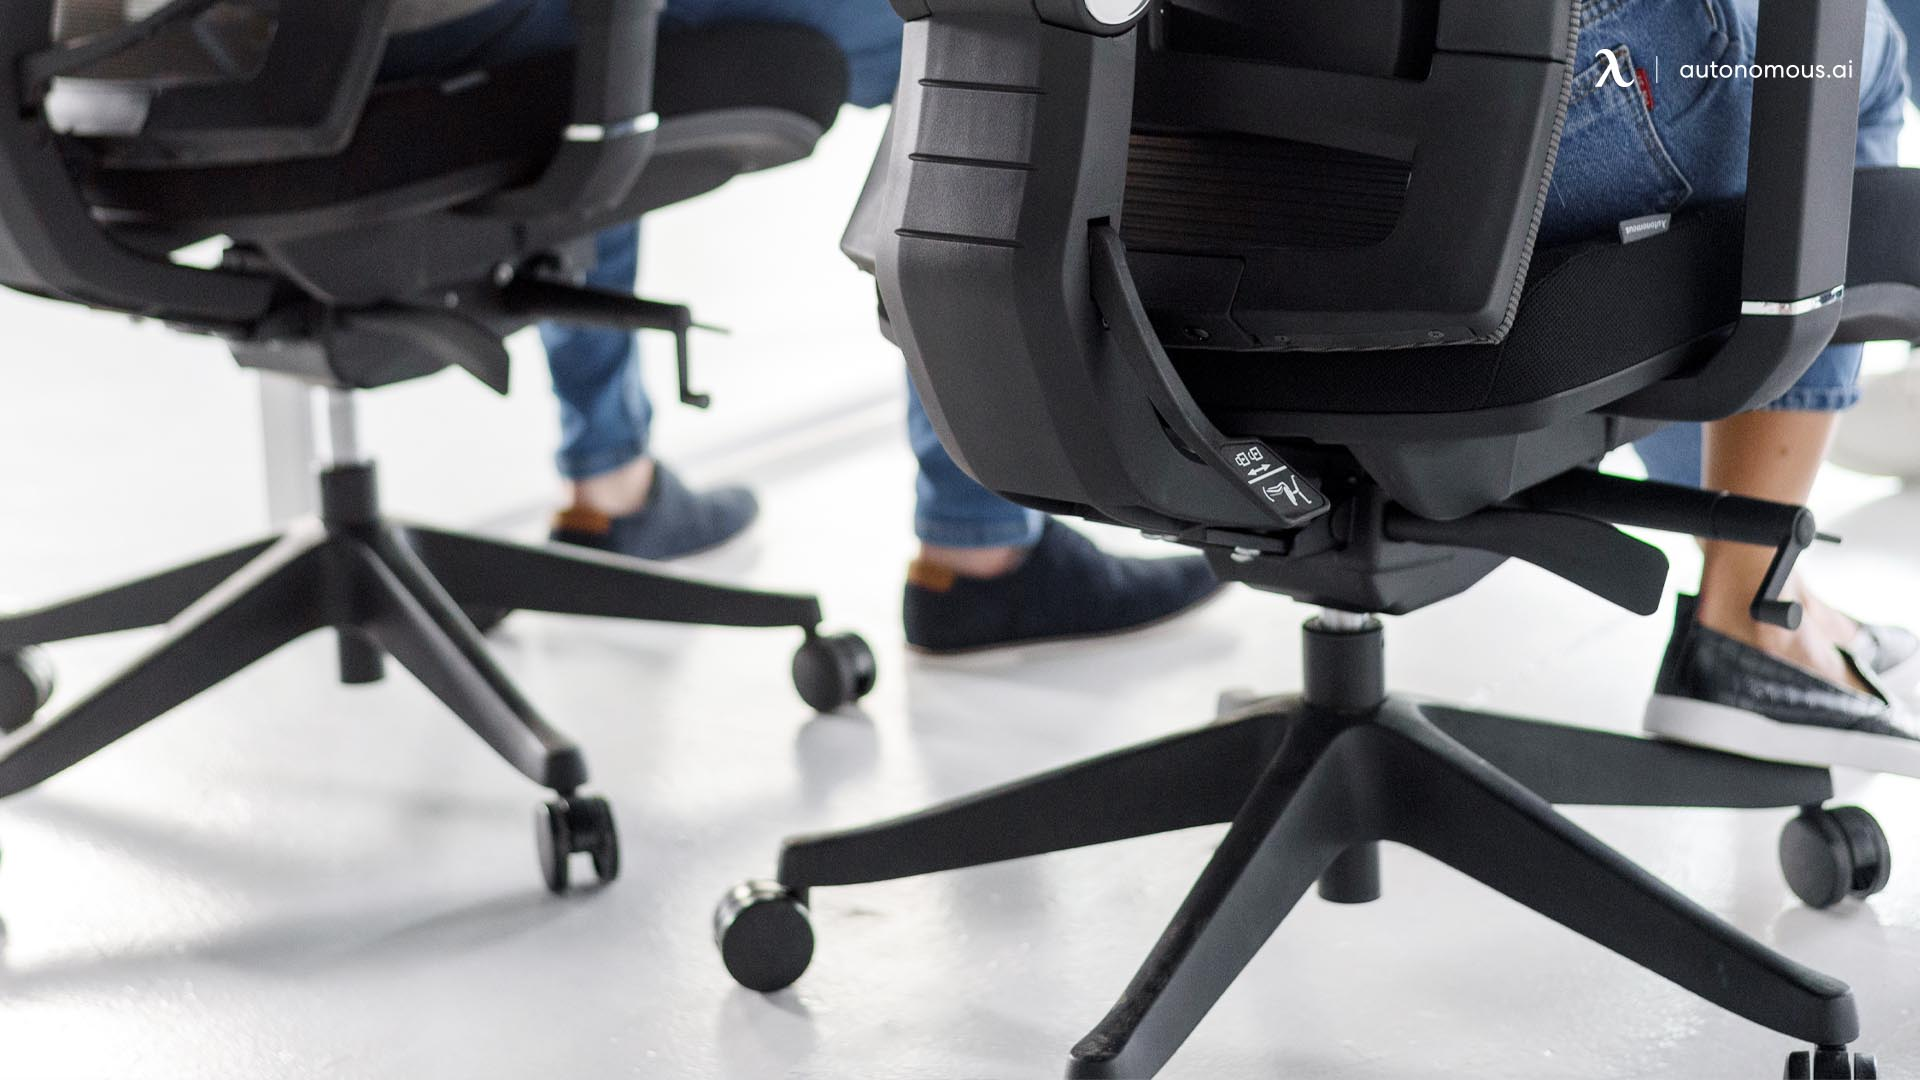 Chair seat width & depth